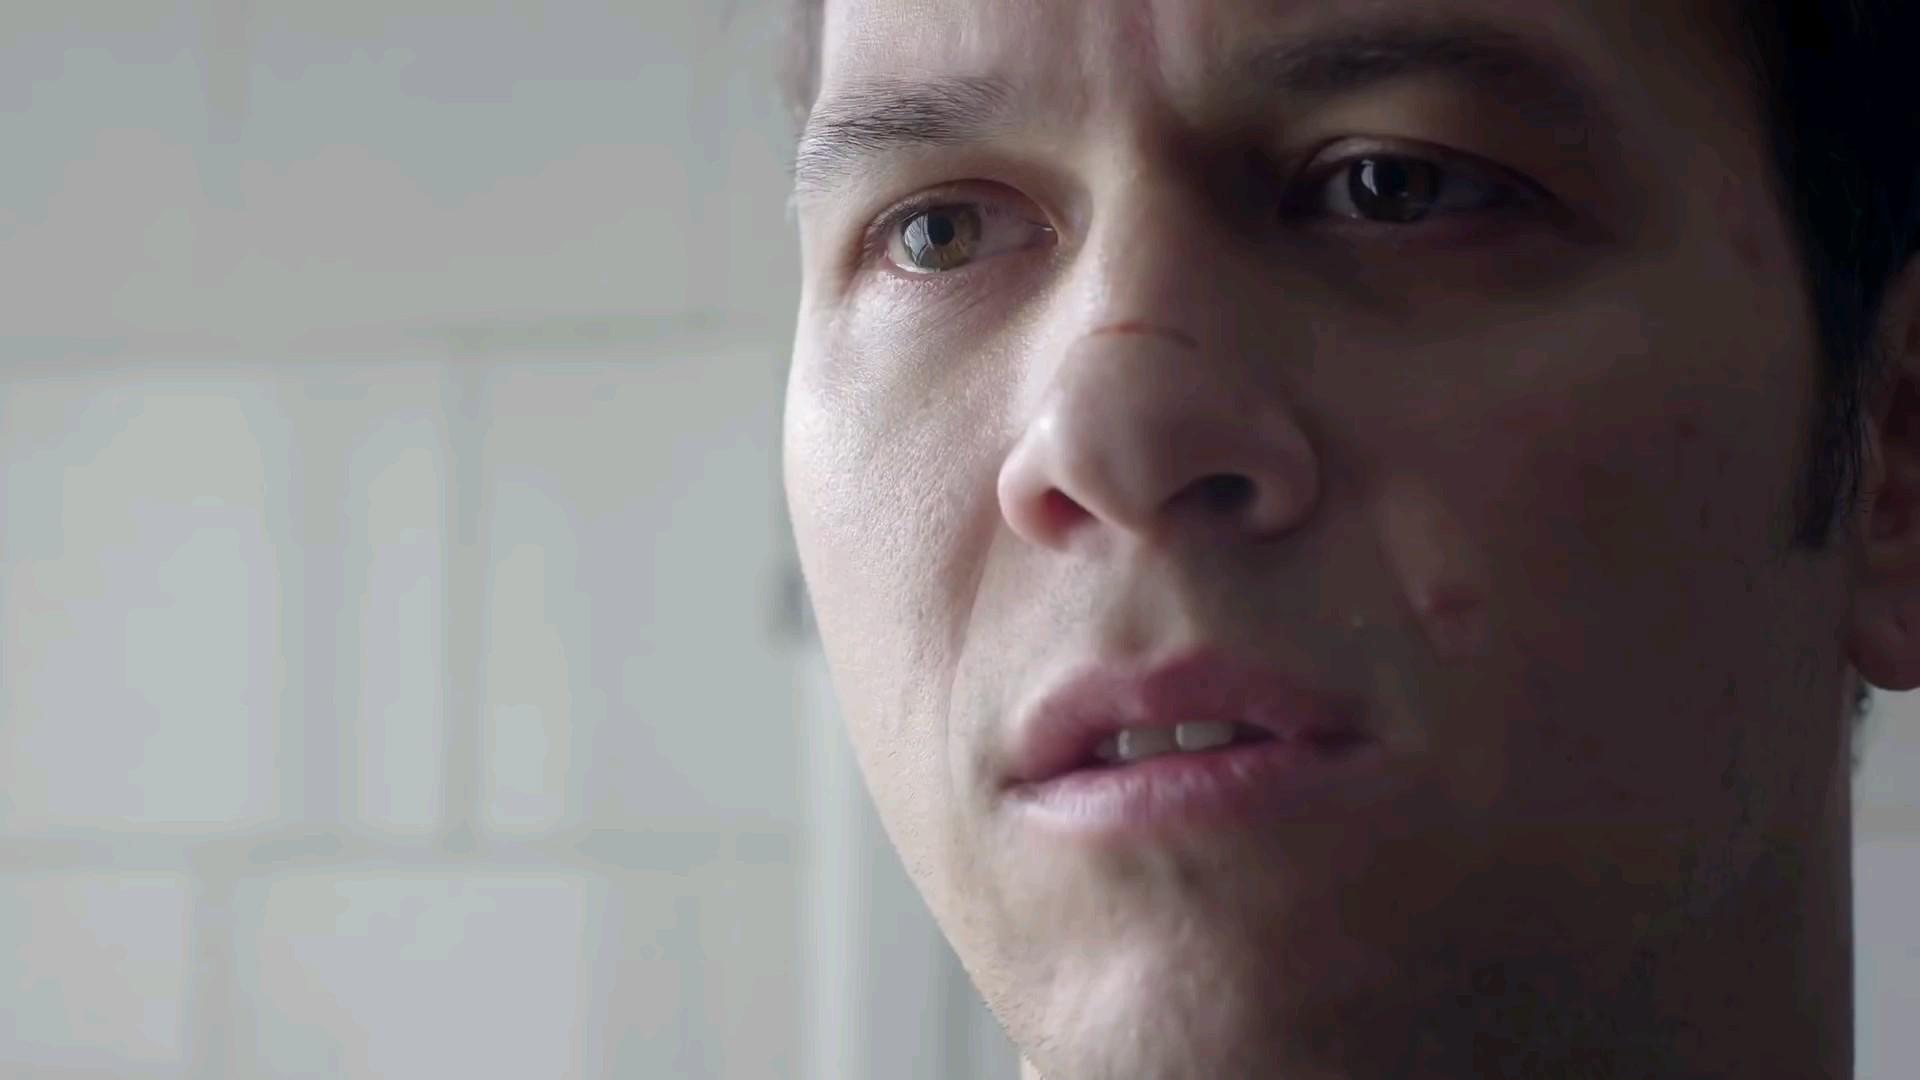 İtirazım Var | 2014 | Yerli Film | NF | WEB-DL | XviD | Sansürsüz | m720p - m1080p | WEB-DL | Tek Link